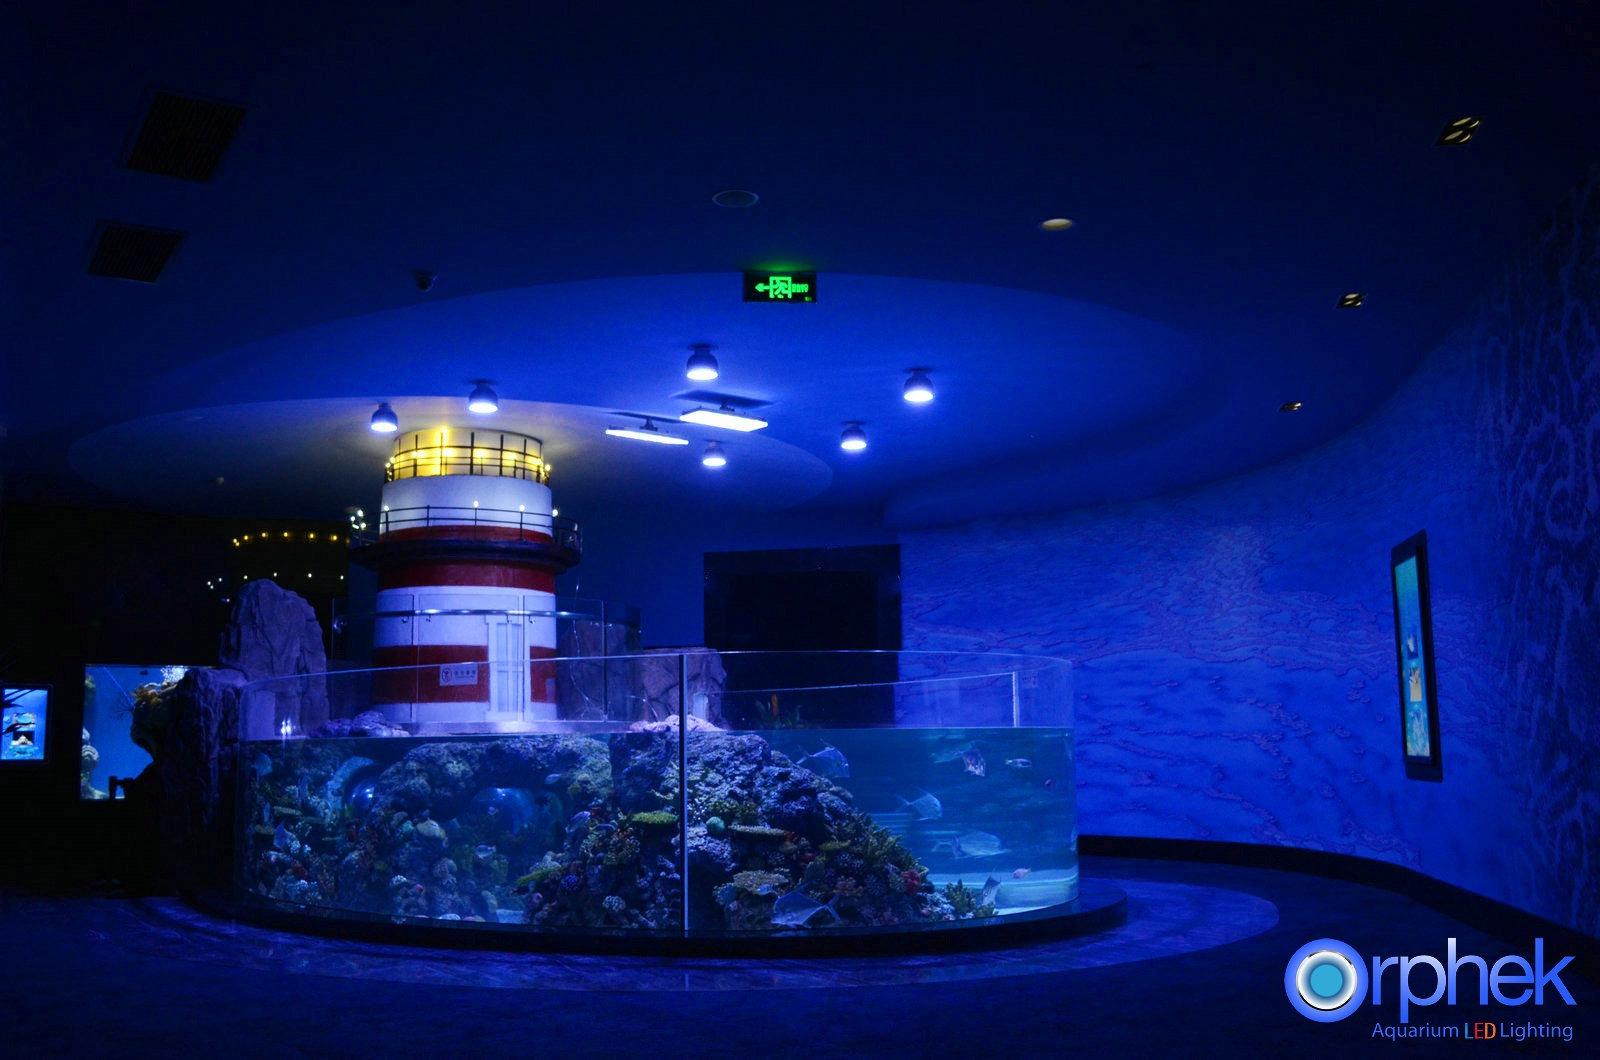 chengdu ffentliches aquarium led lichtprojekt aquarium led beleuchtung orphek. Black Bedroom Furniture Sets. Home Design Ideas